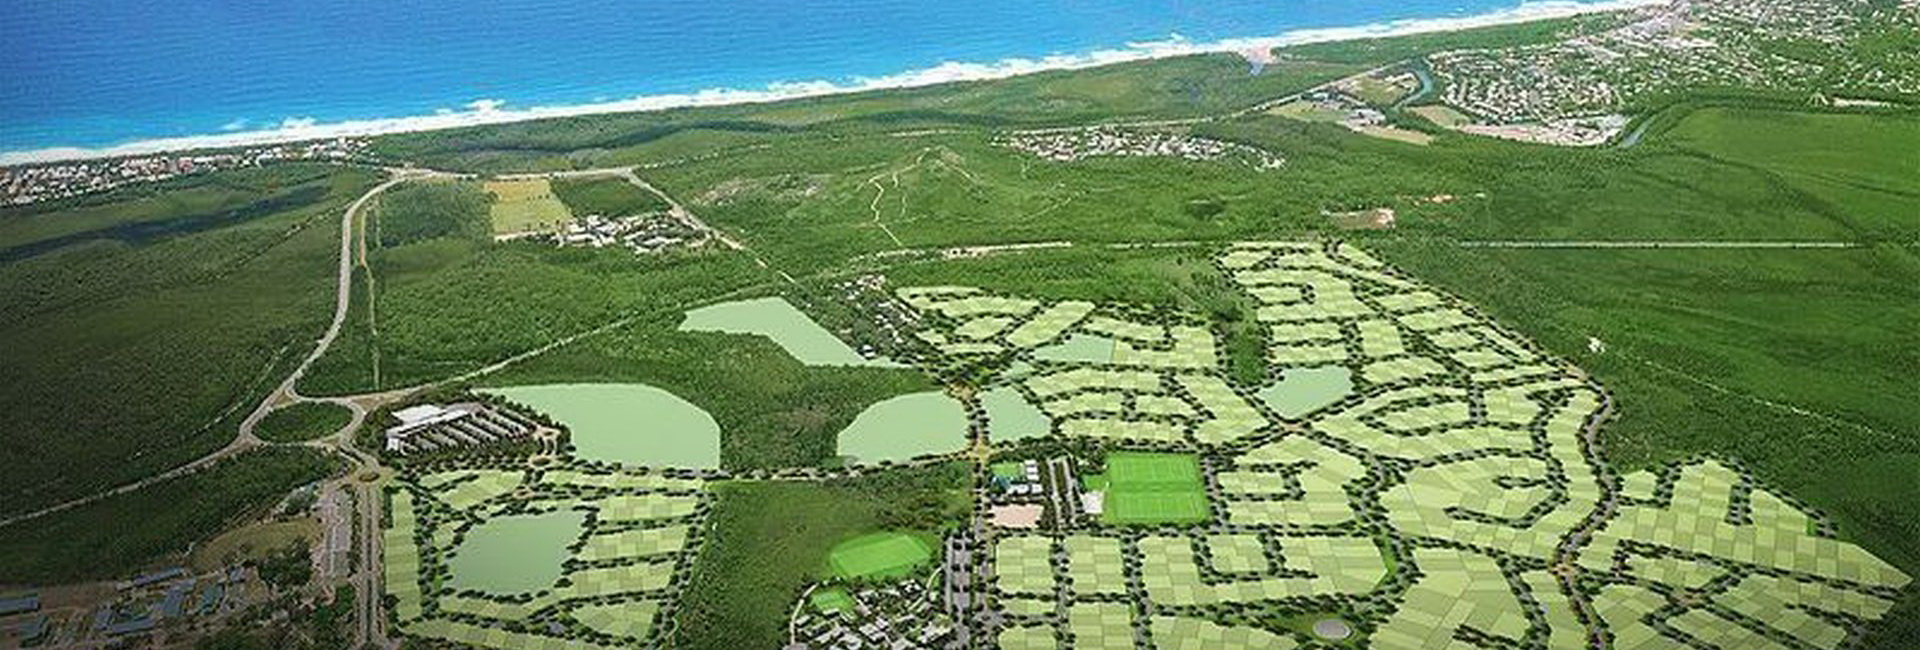 JFP Urban Designers reviewing new Queensland project